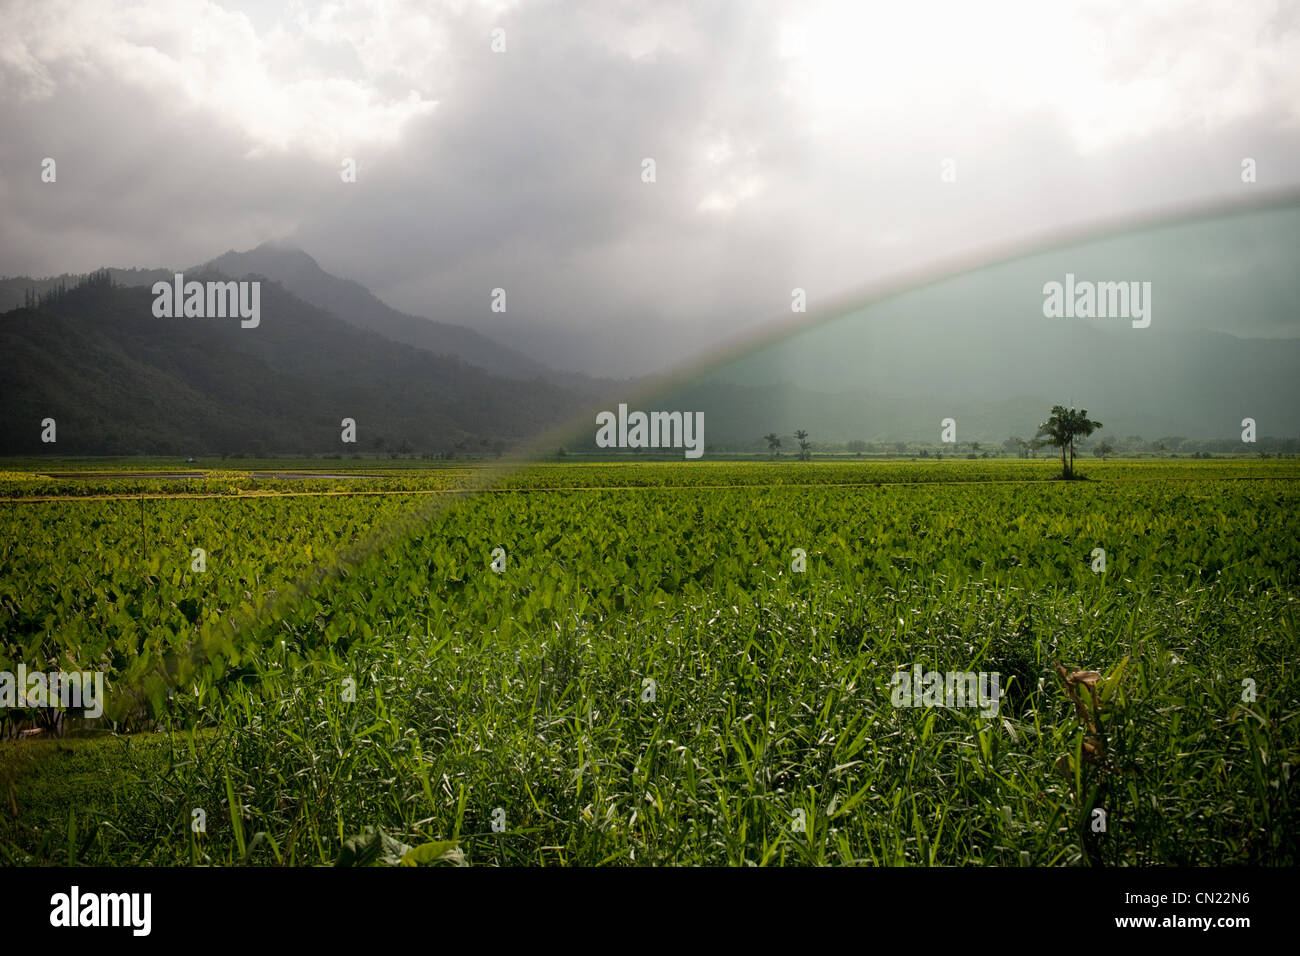 Hawaiian landscape seen through car window - Stock Image